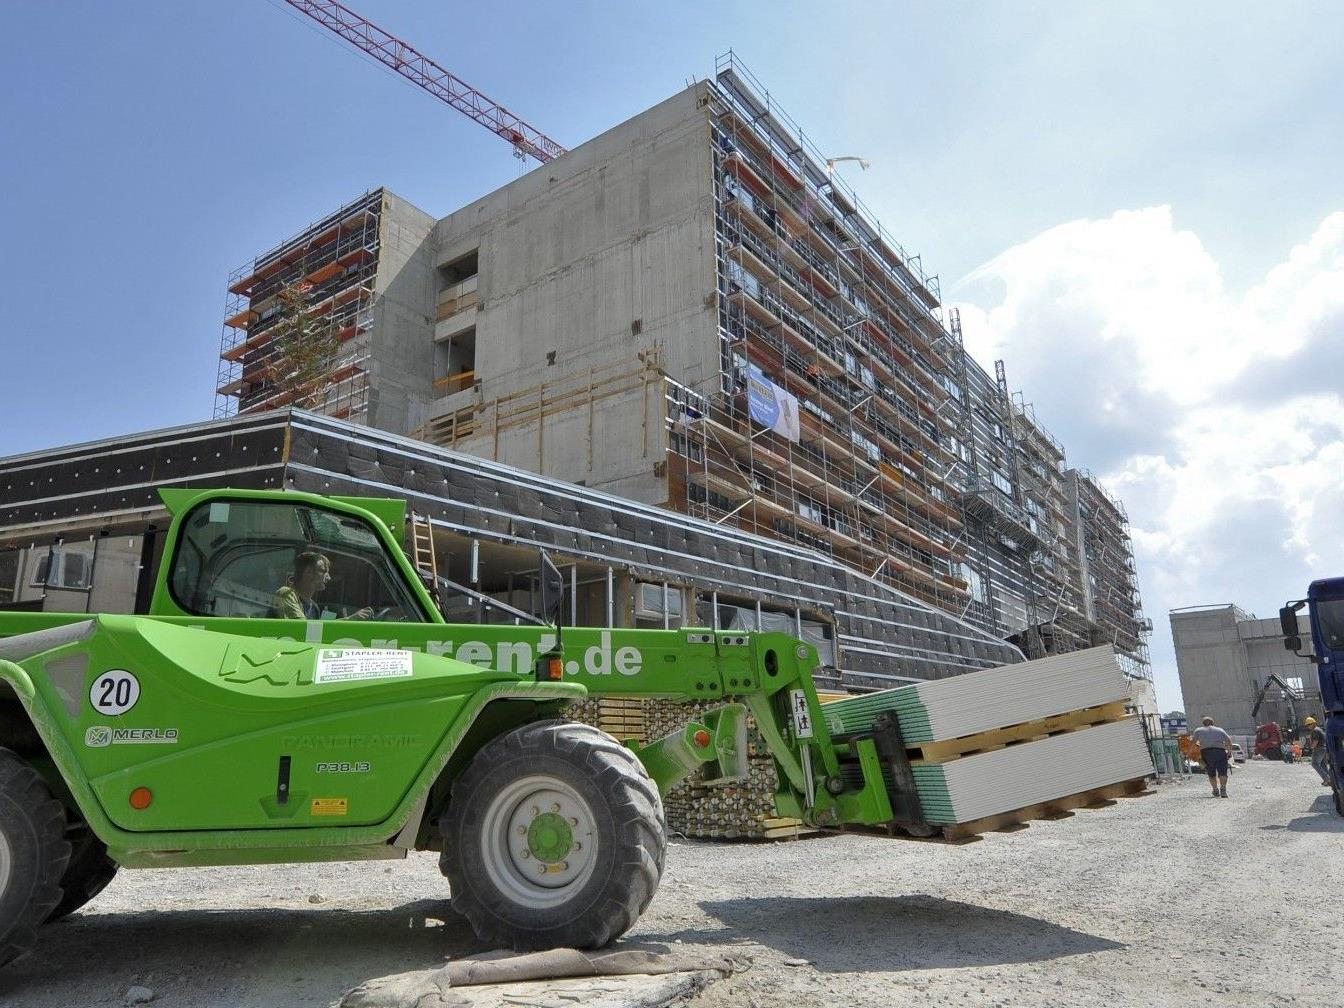 Die neue WU in Wien-Leopoldstadt soll im Herbst 2013 in den Vollbetrieb starten.